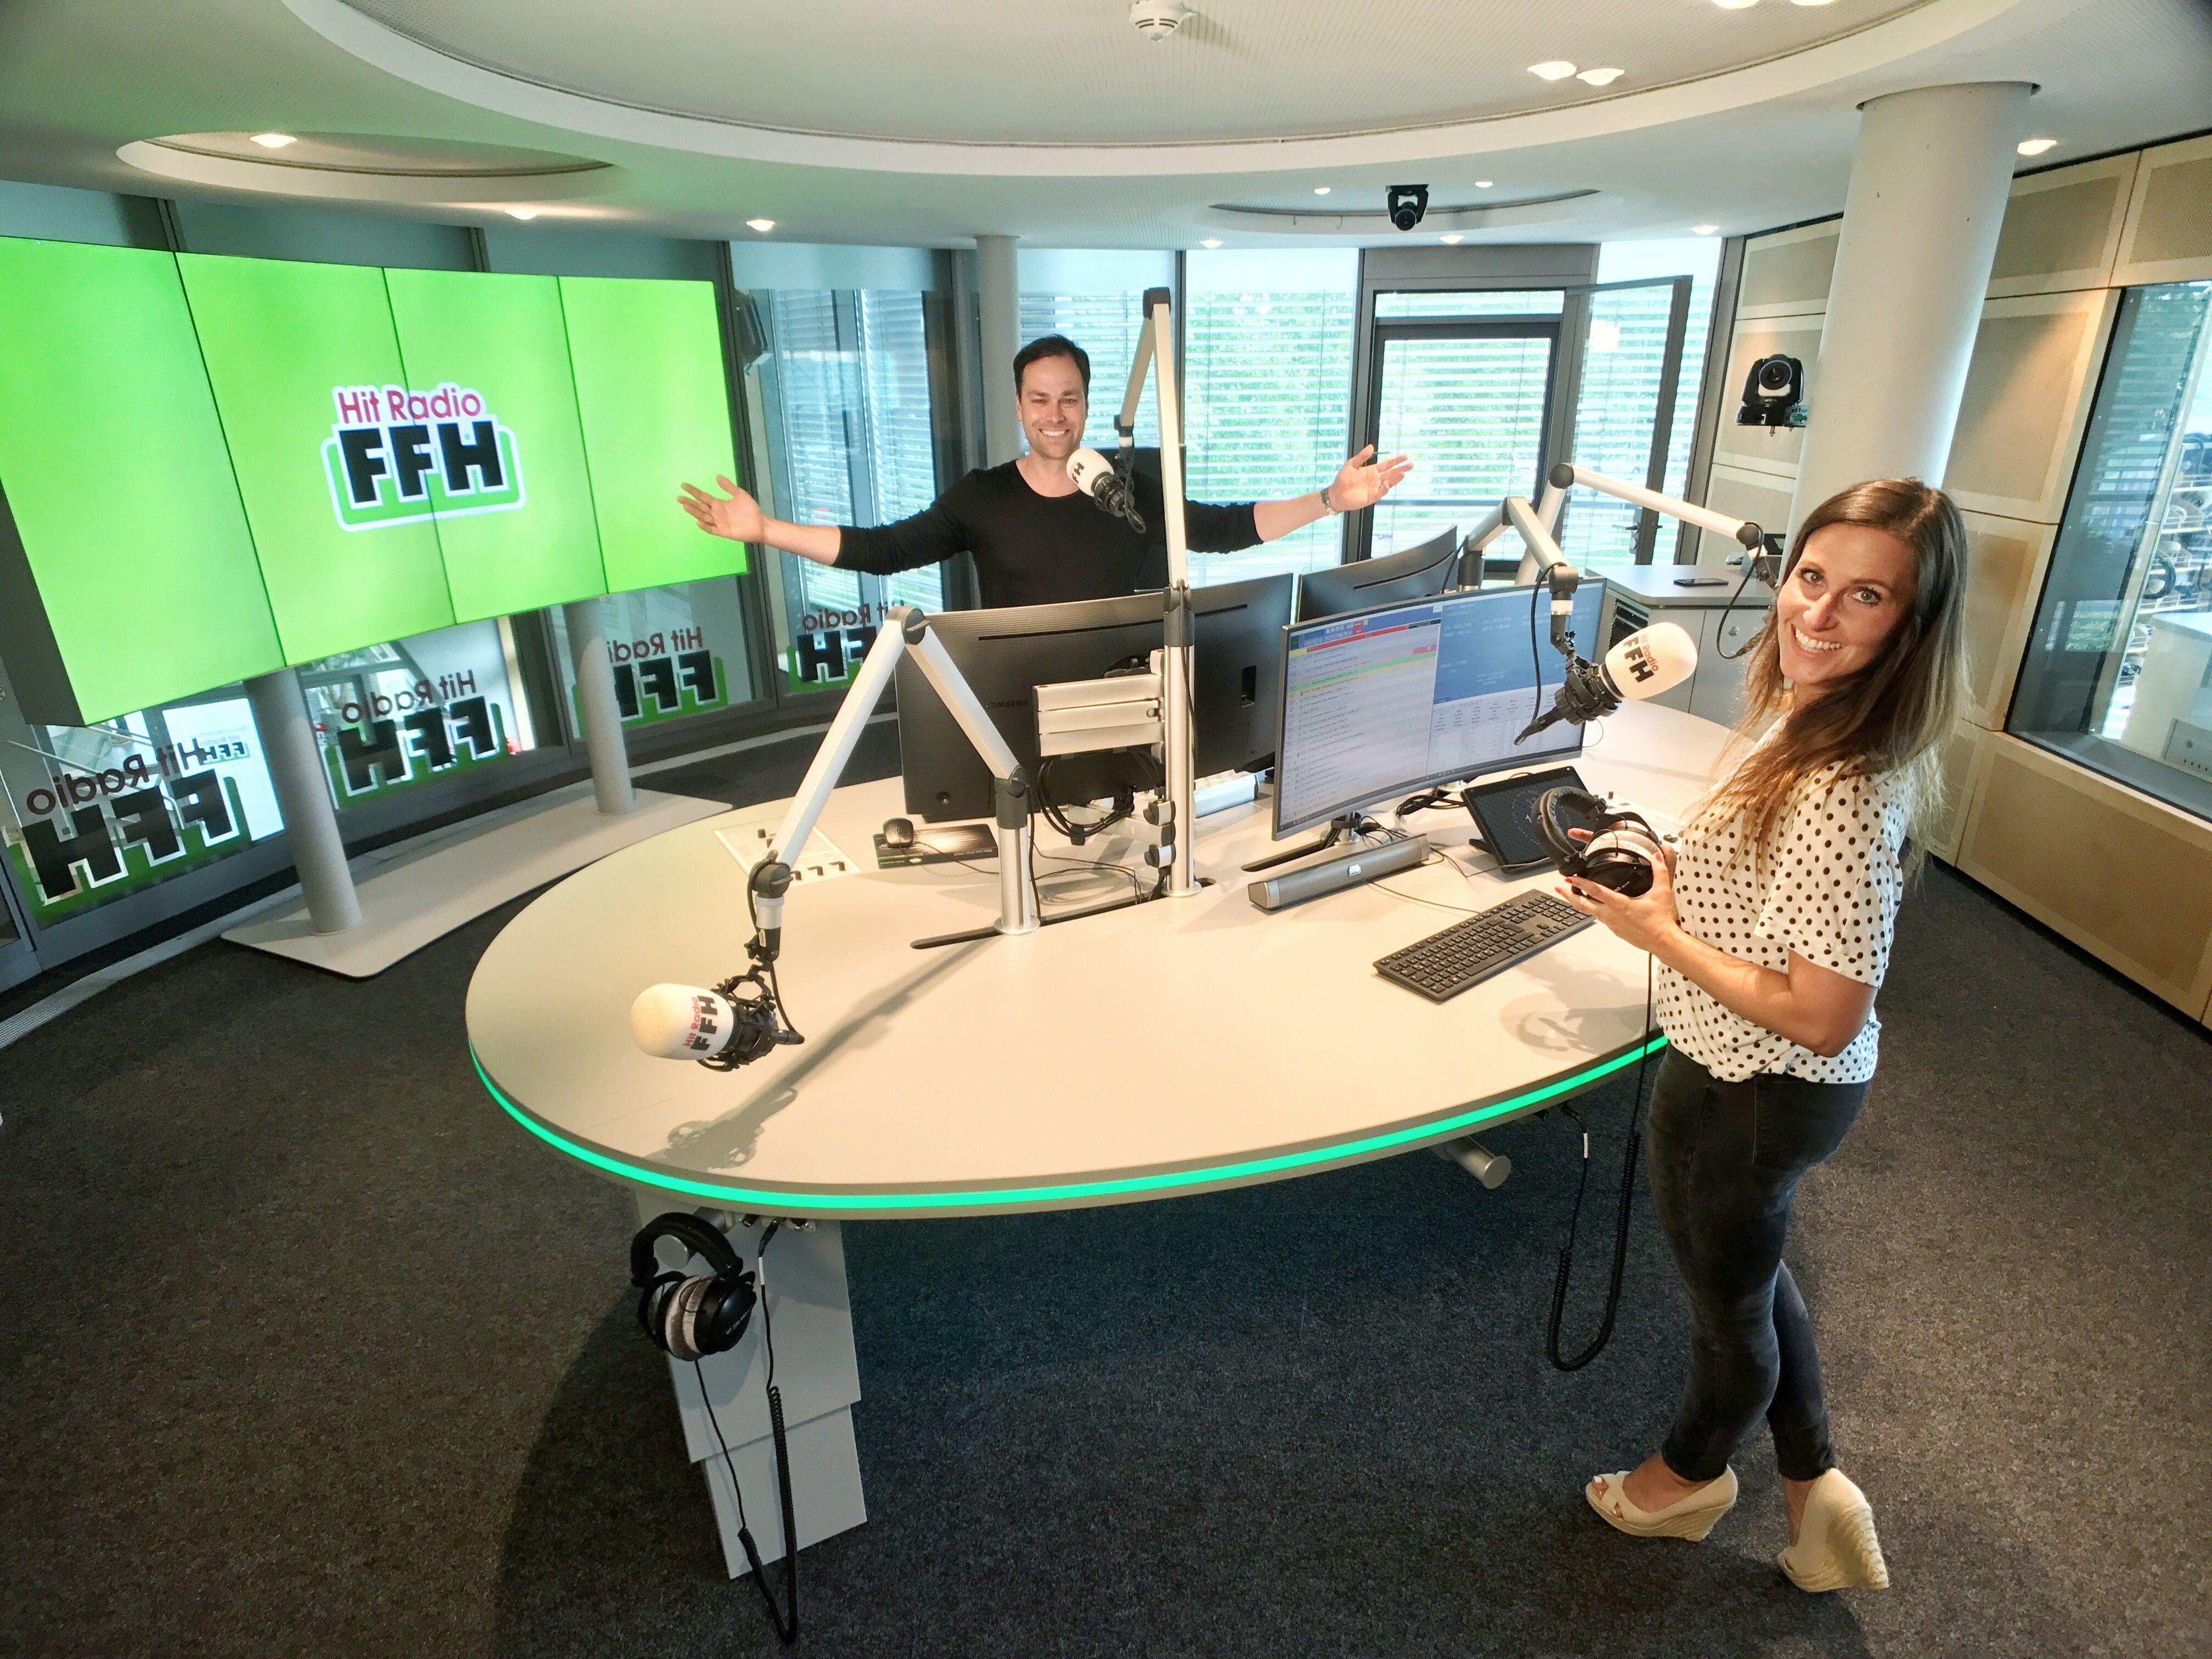 Ffh Morningshow Neue Moderatorin